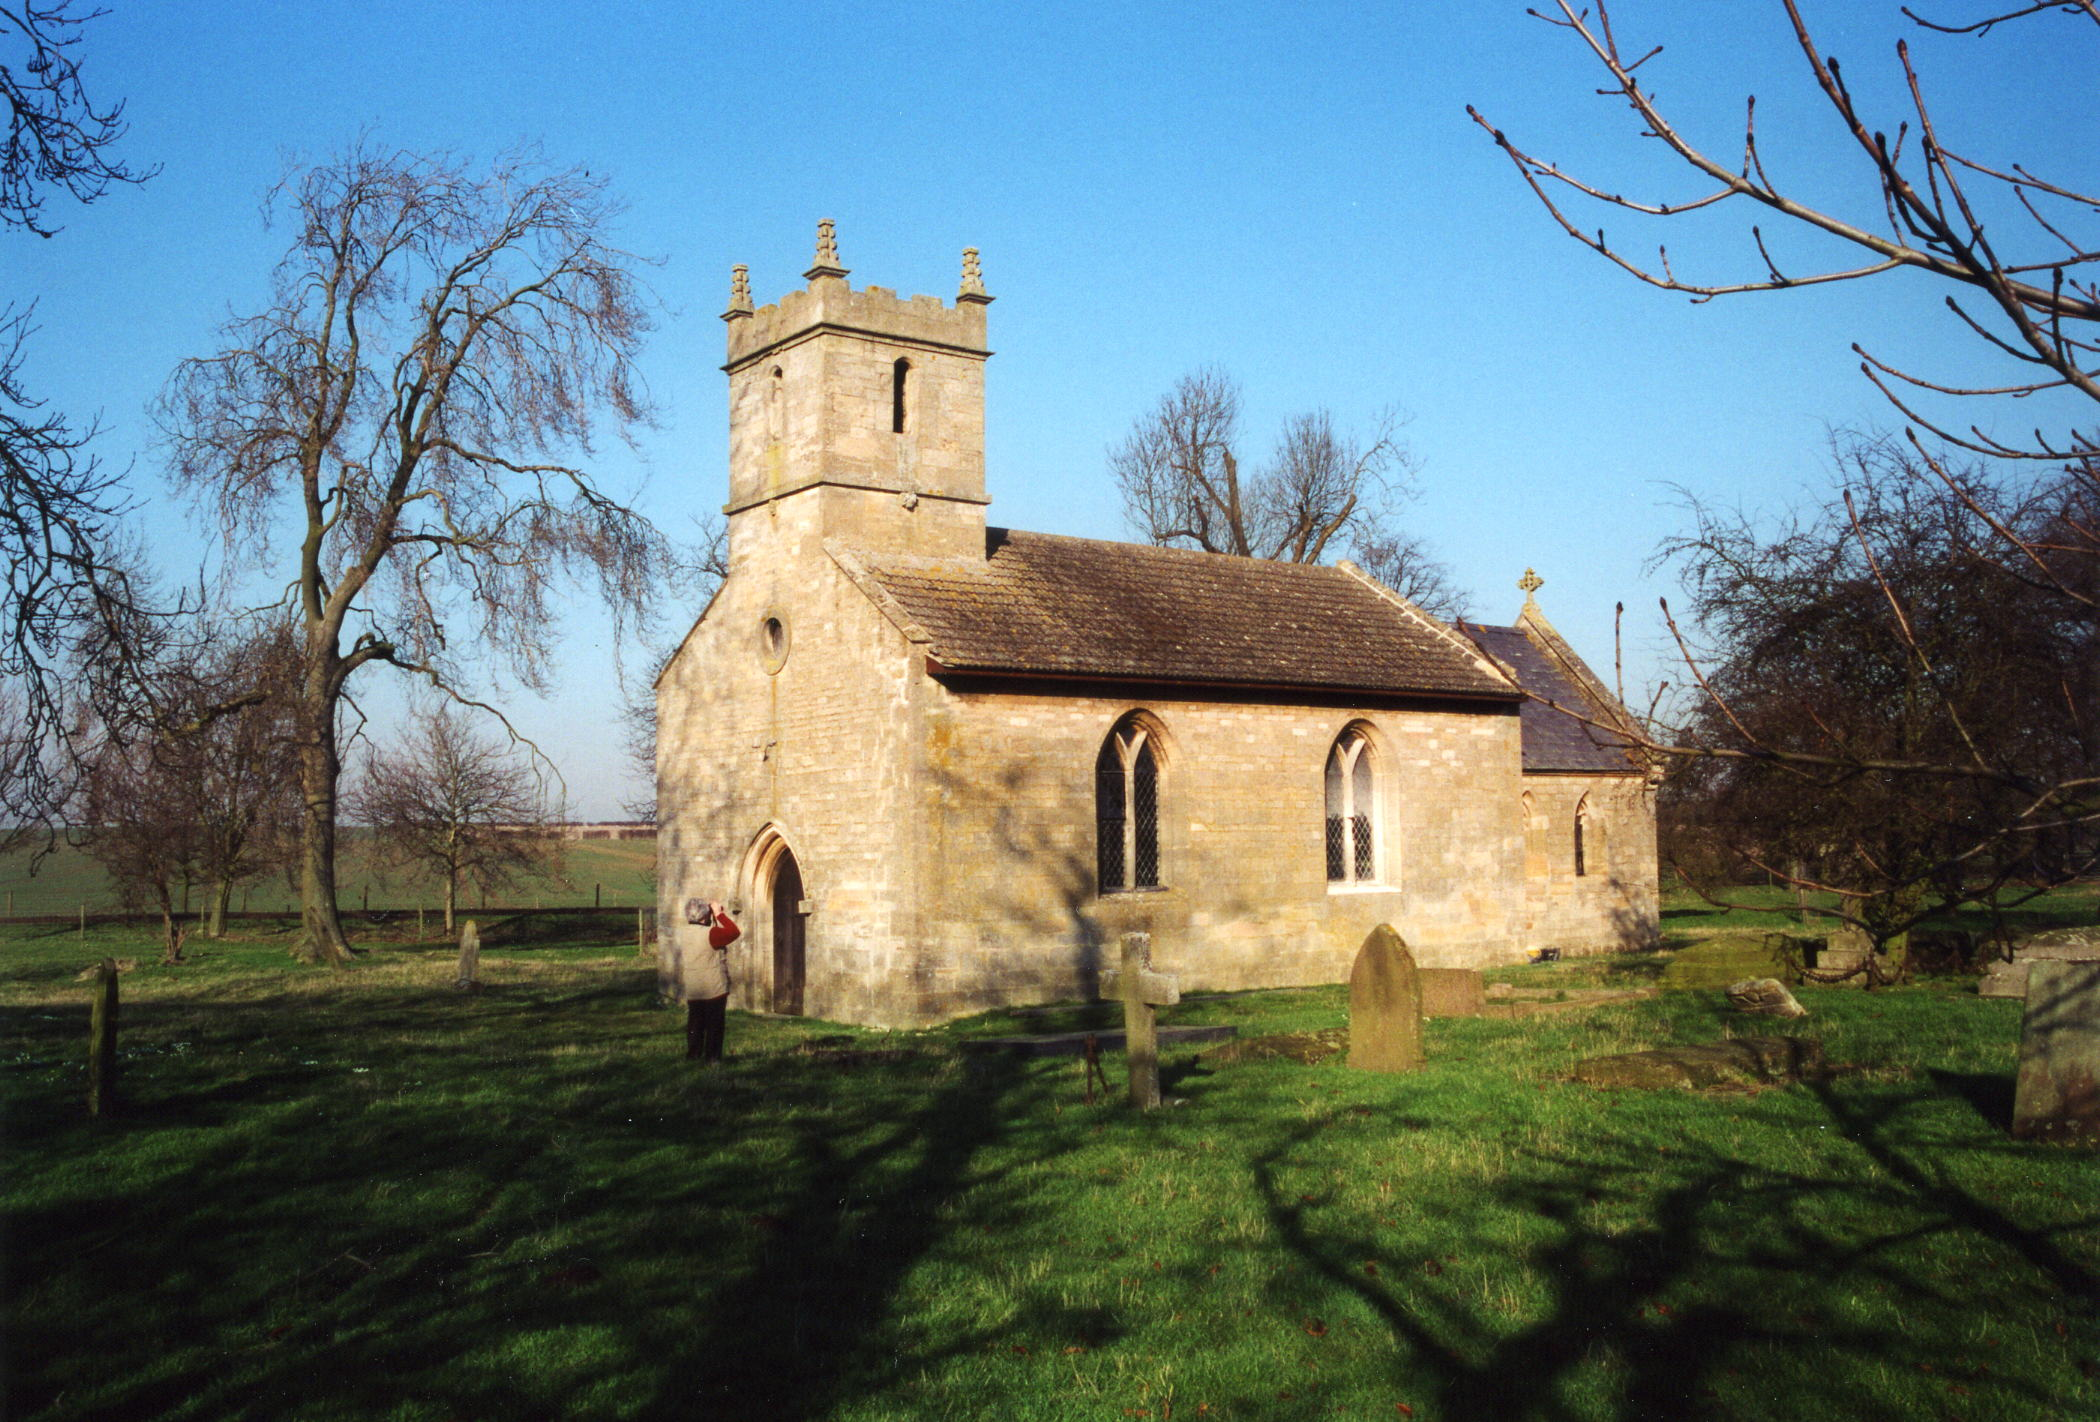 Brauncewell All Saints parish church